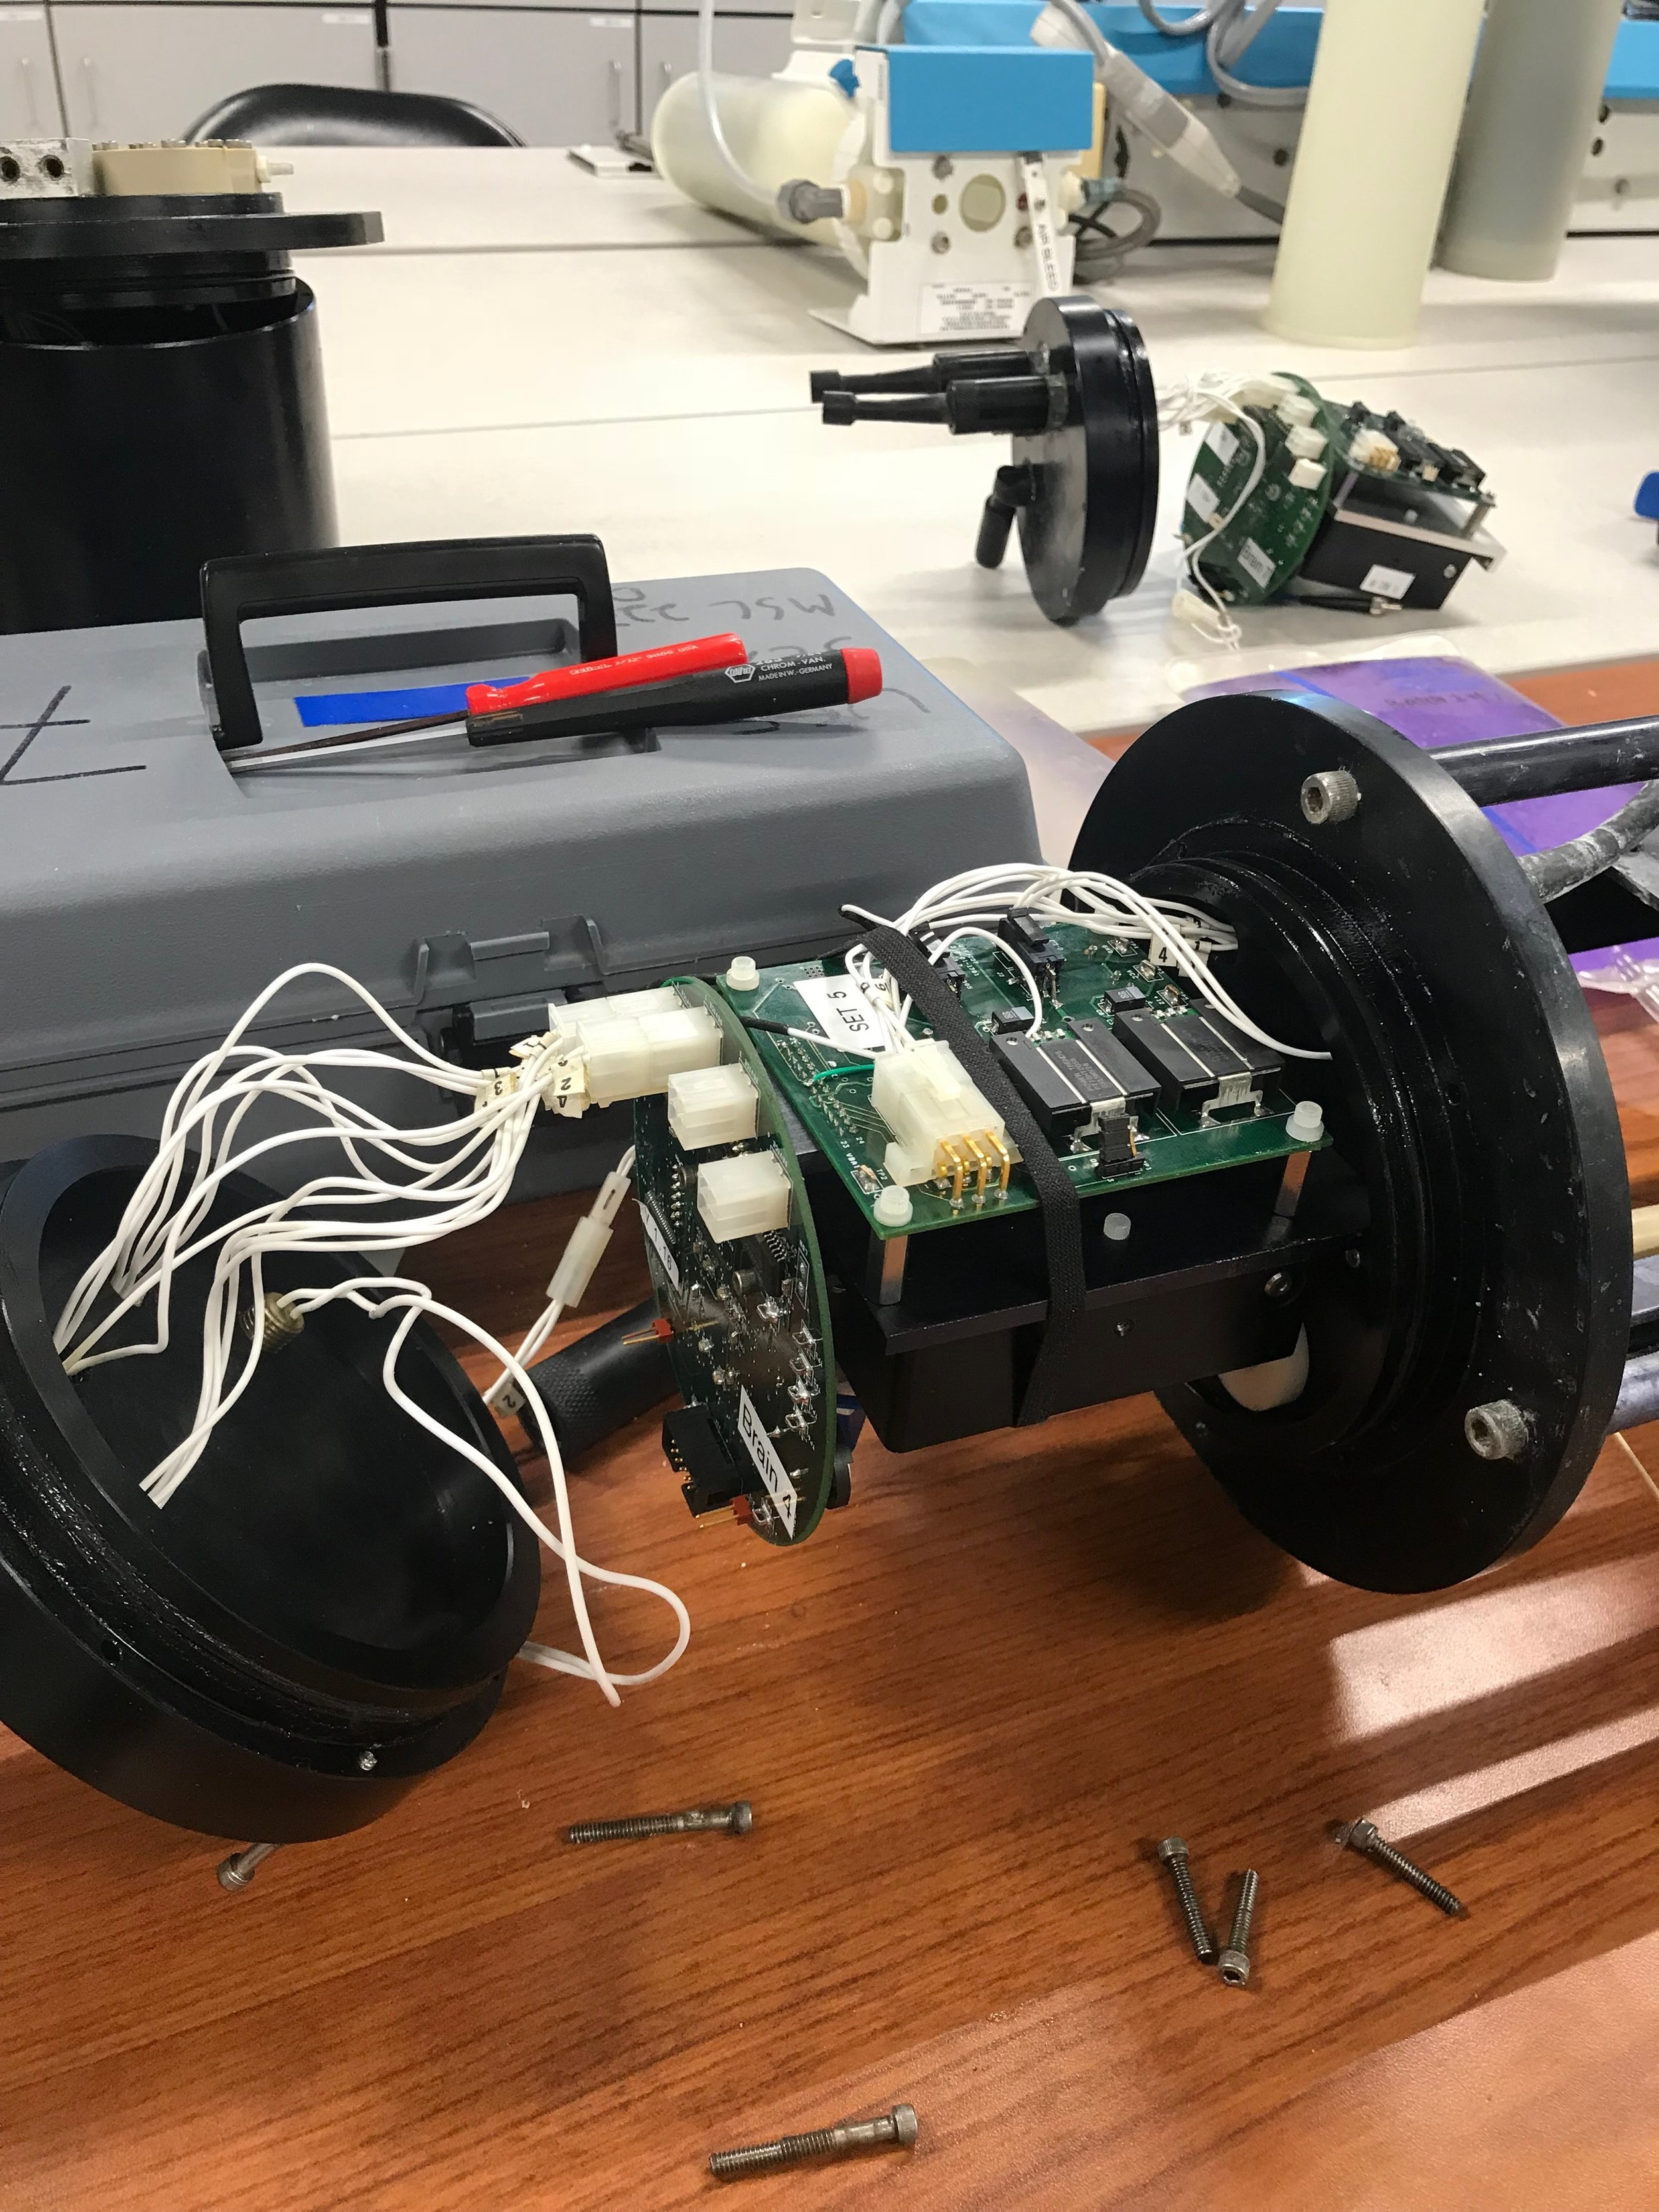 When things break, take them apart!